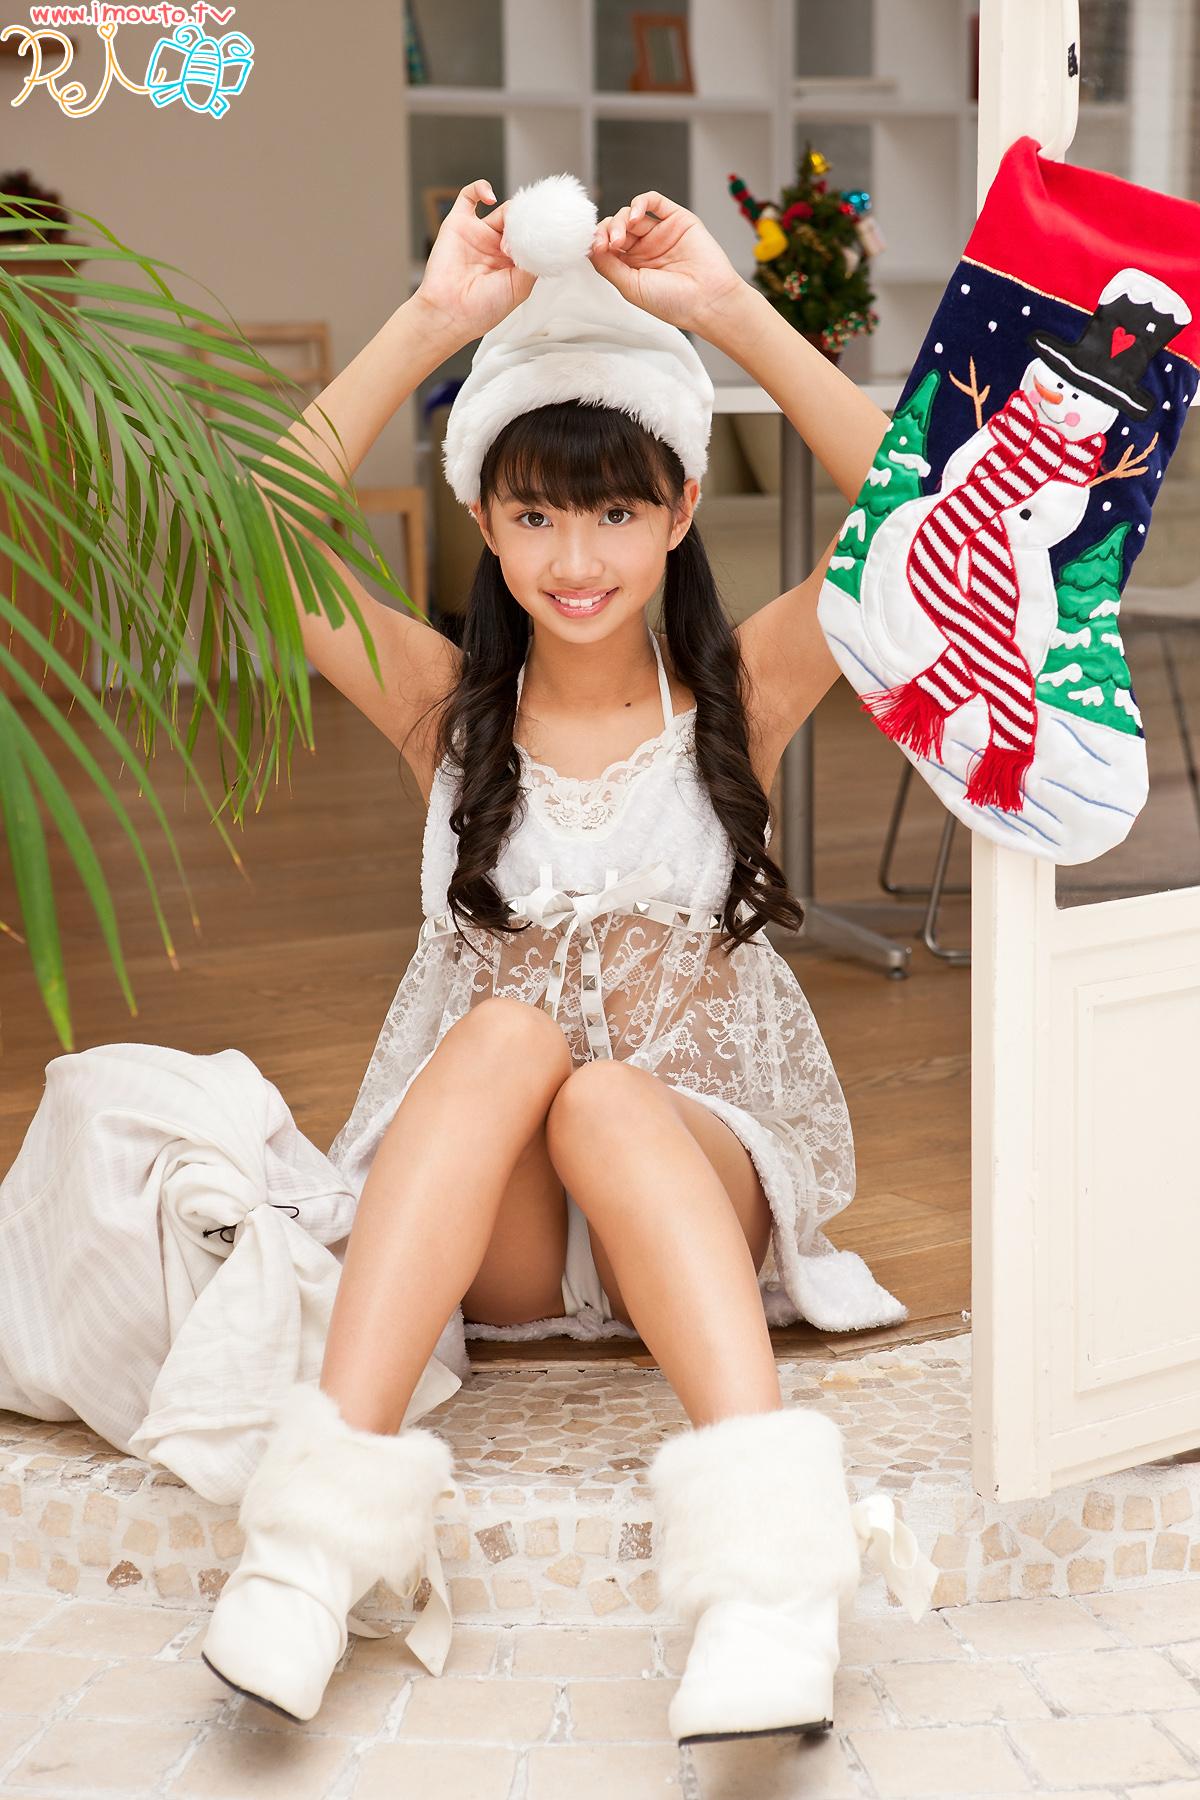 junior idols candydoll galleries aya kuromiya rei kuromiya gallery